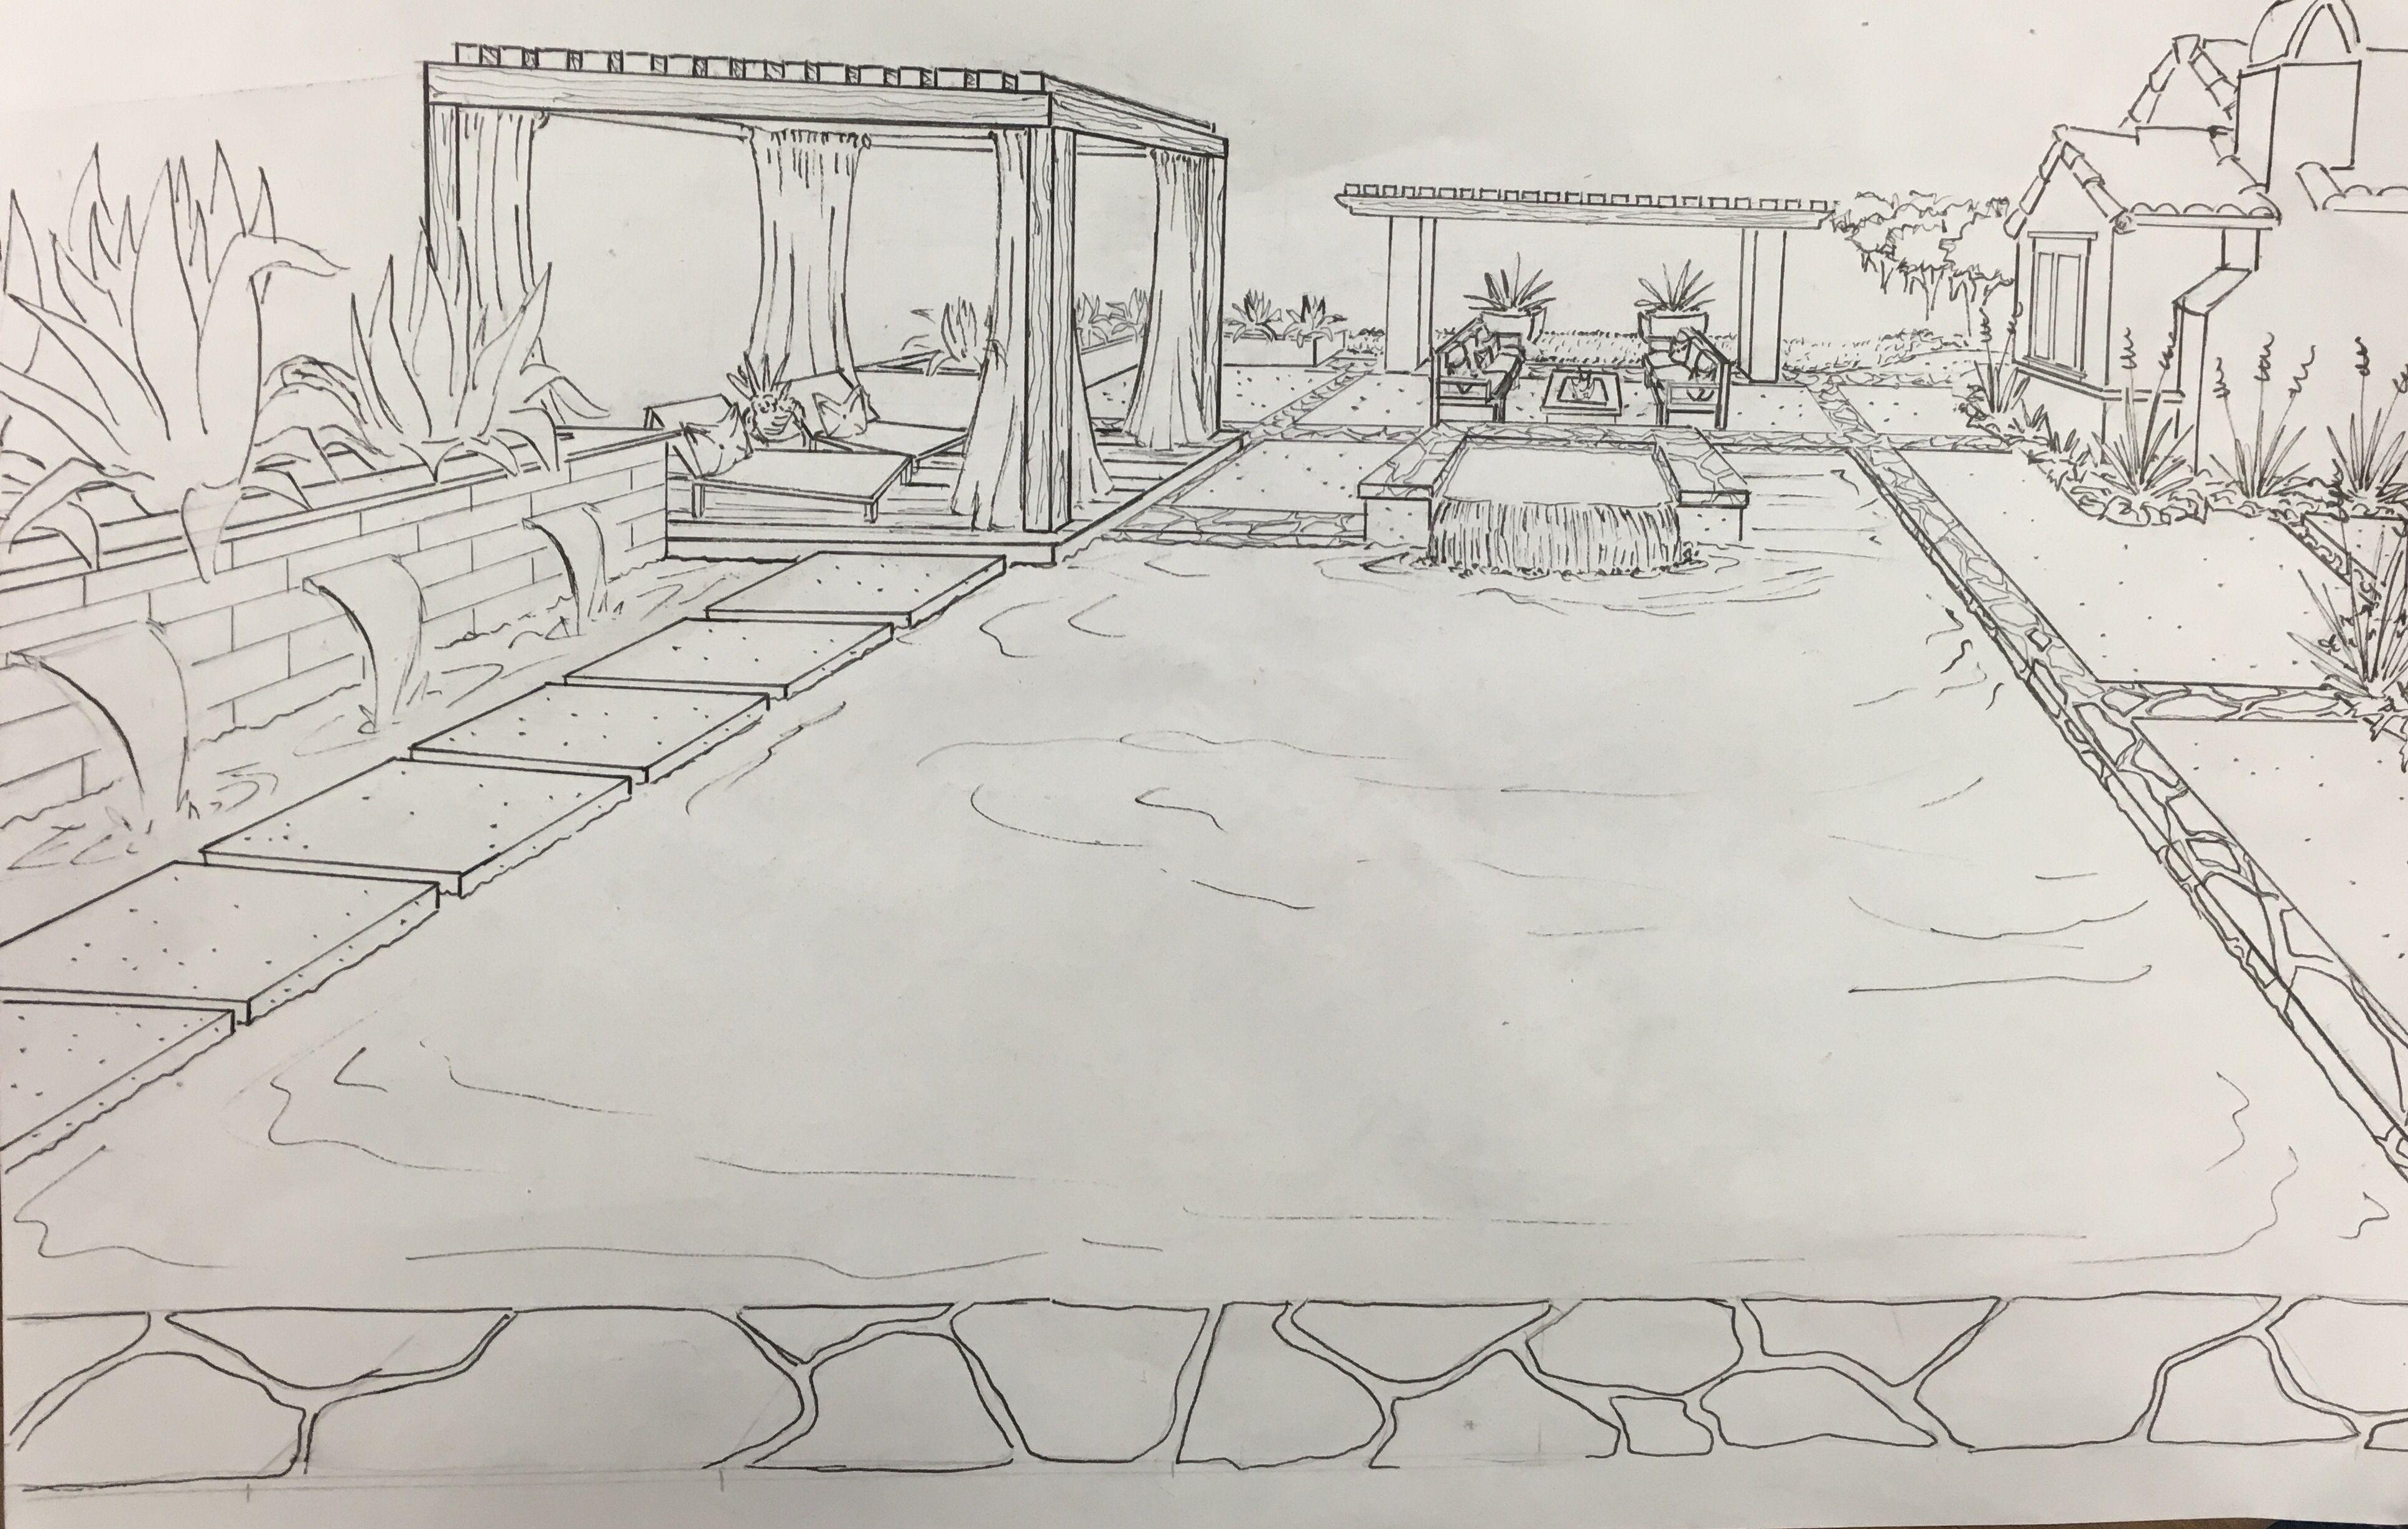 Cleare Fields Backyard Perspective Drawing by Landscape Logic ...